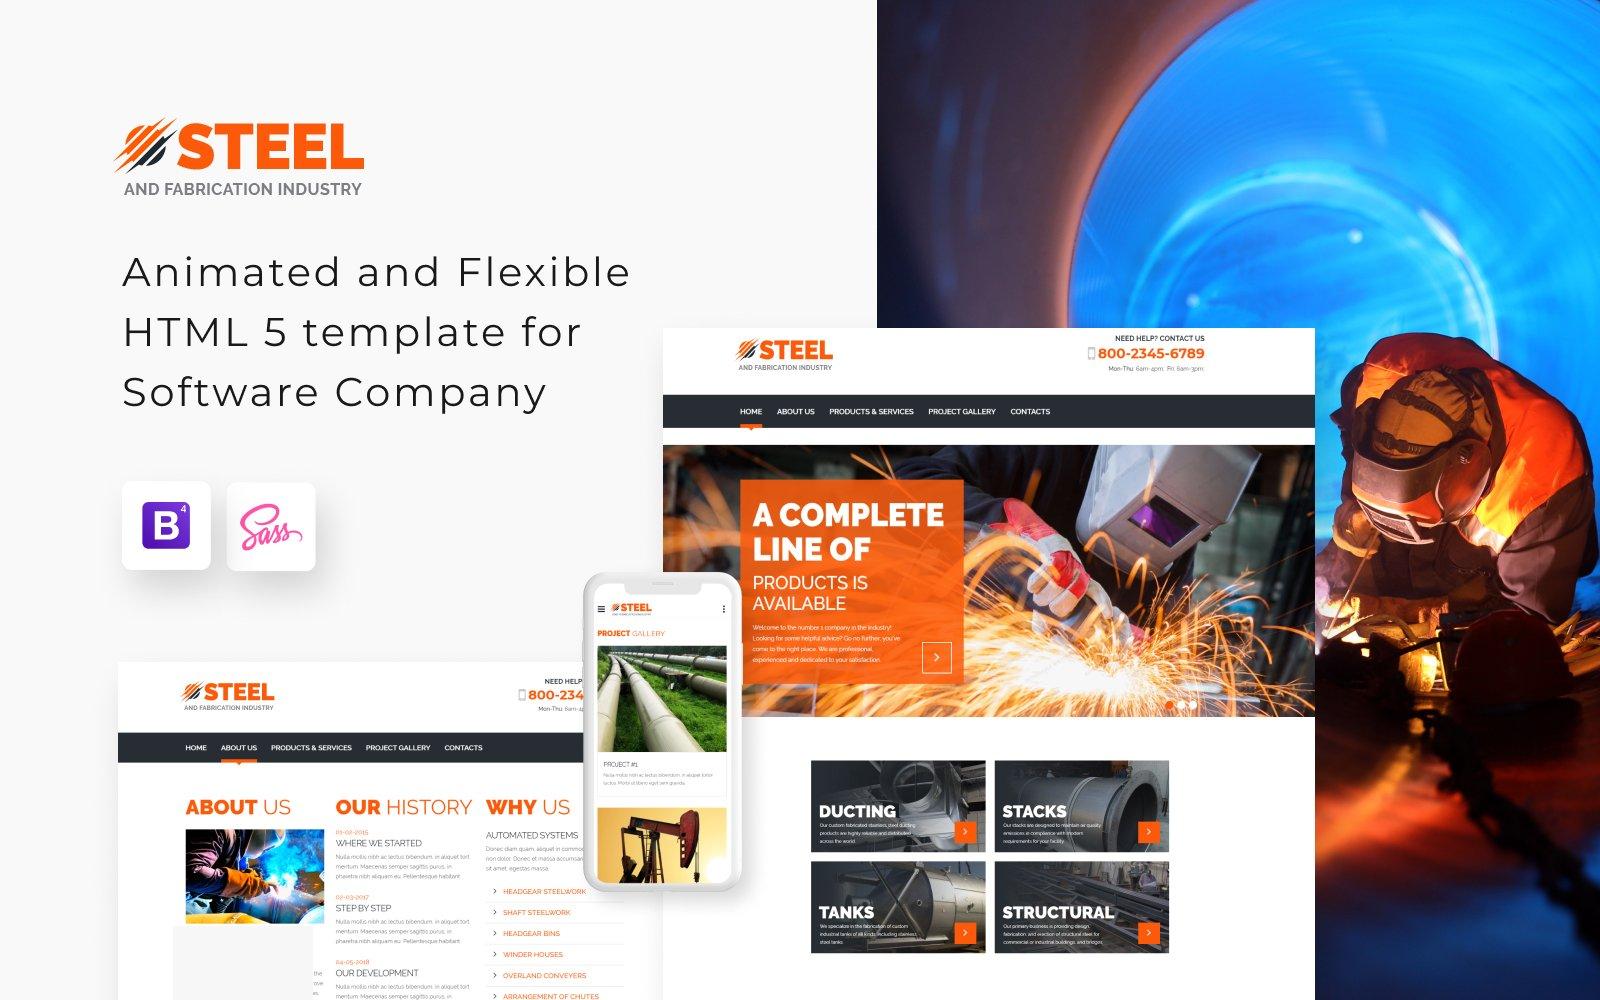 Steel - Metal Fabrication Industry Website Template